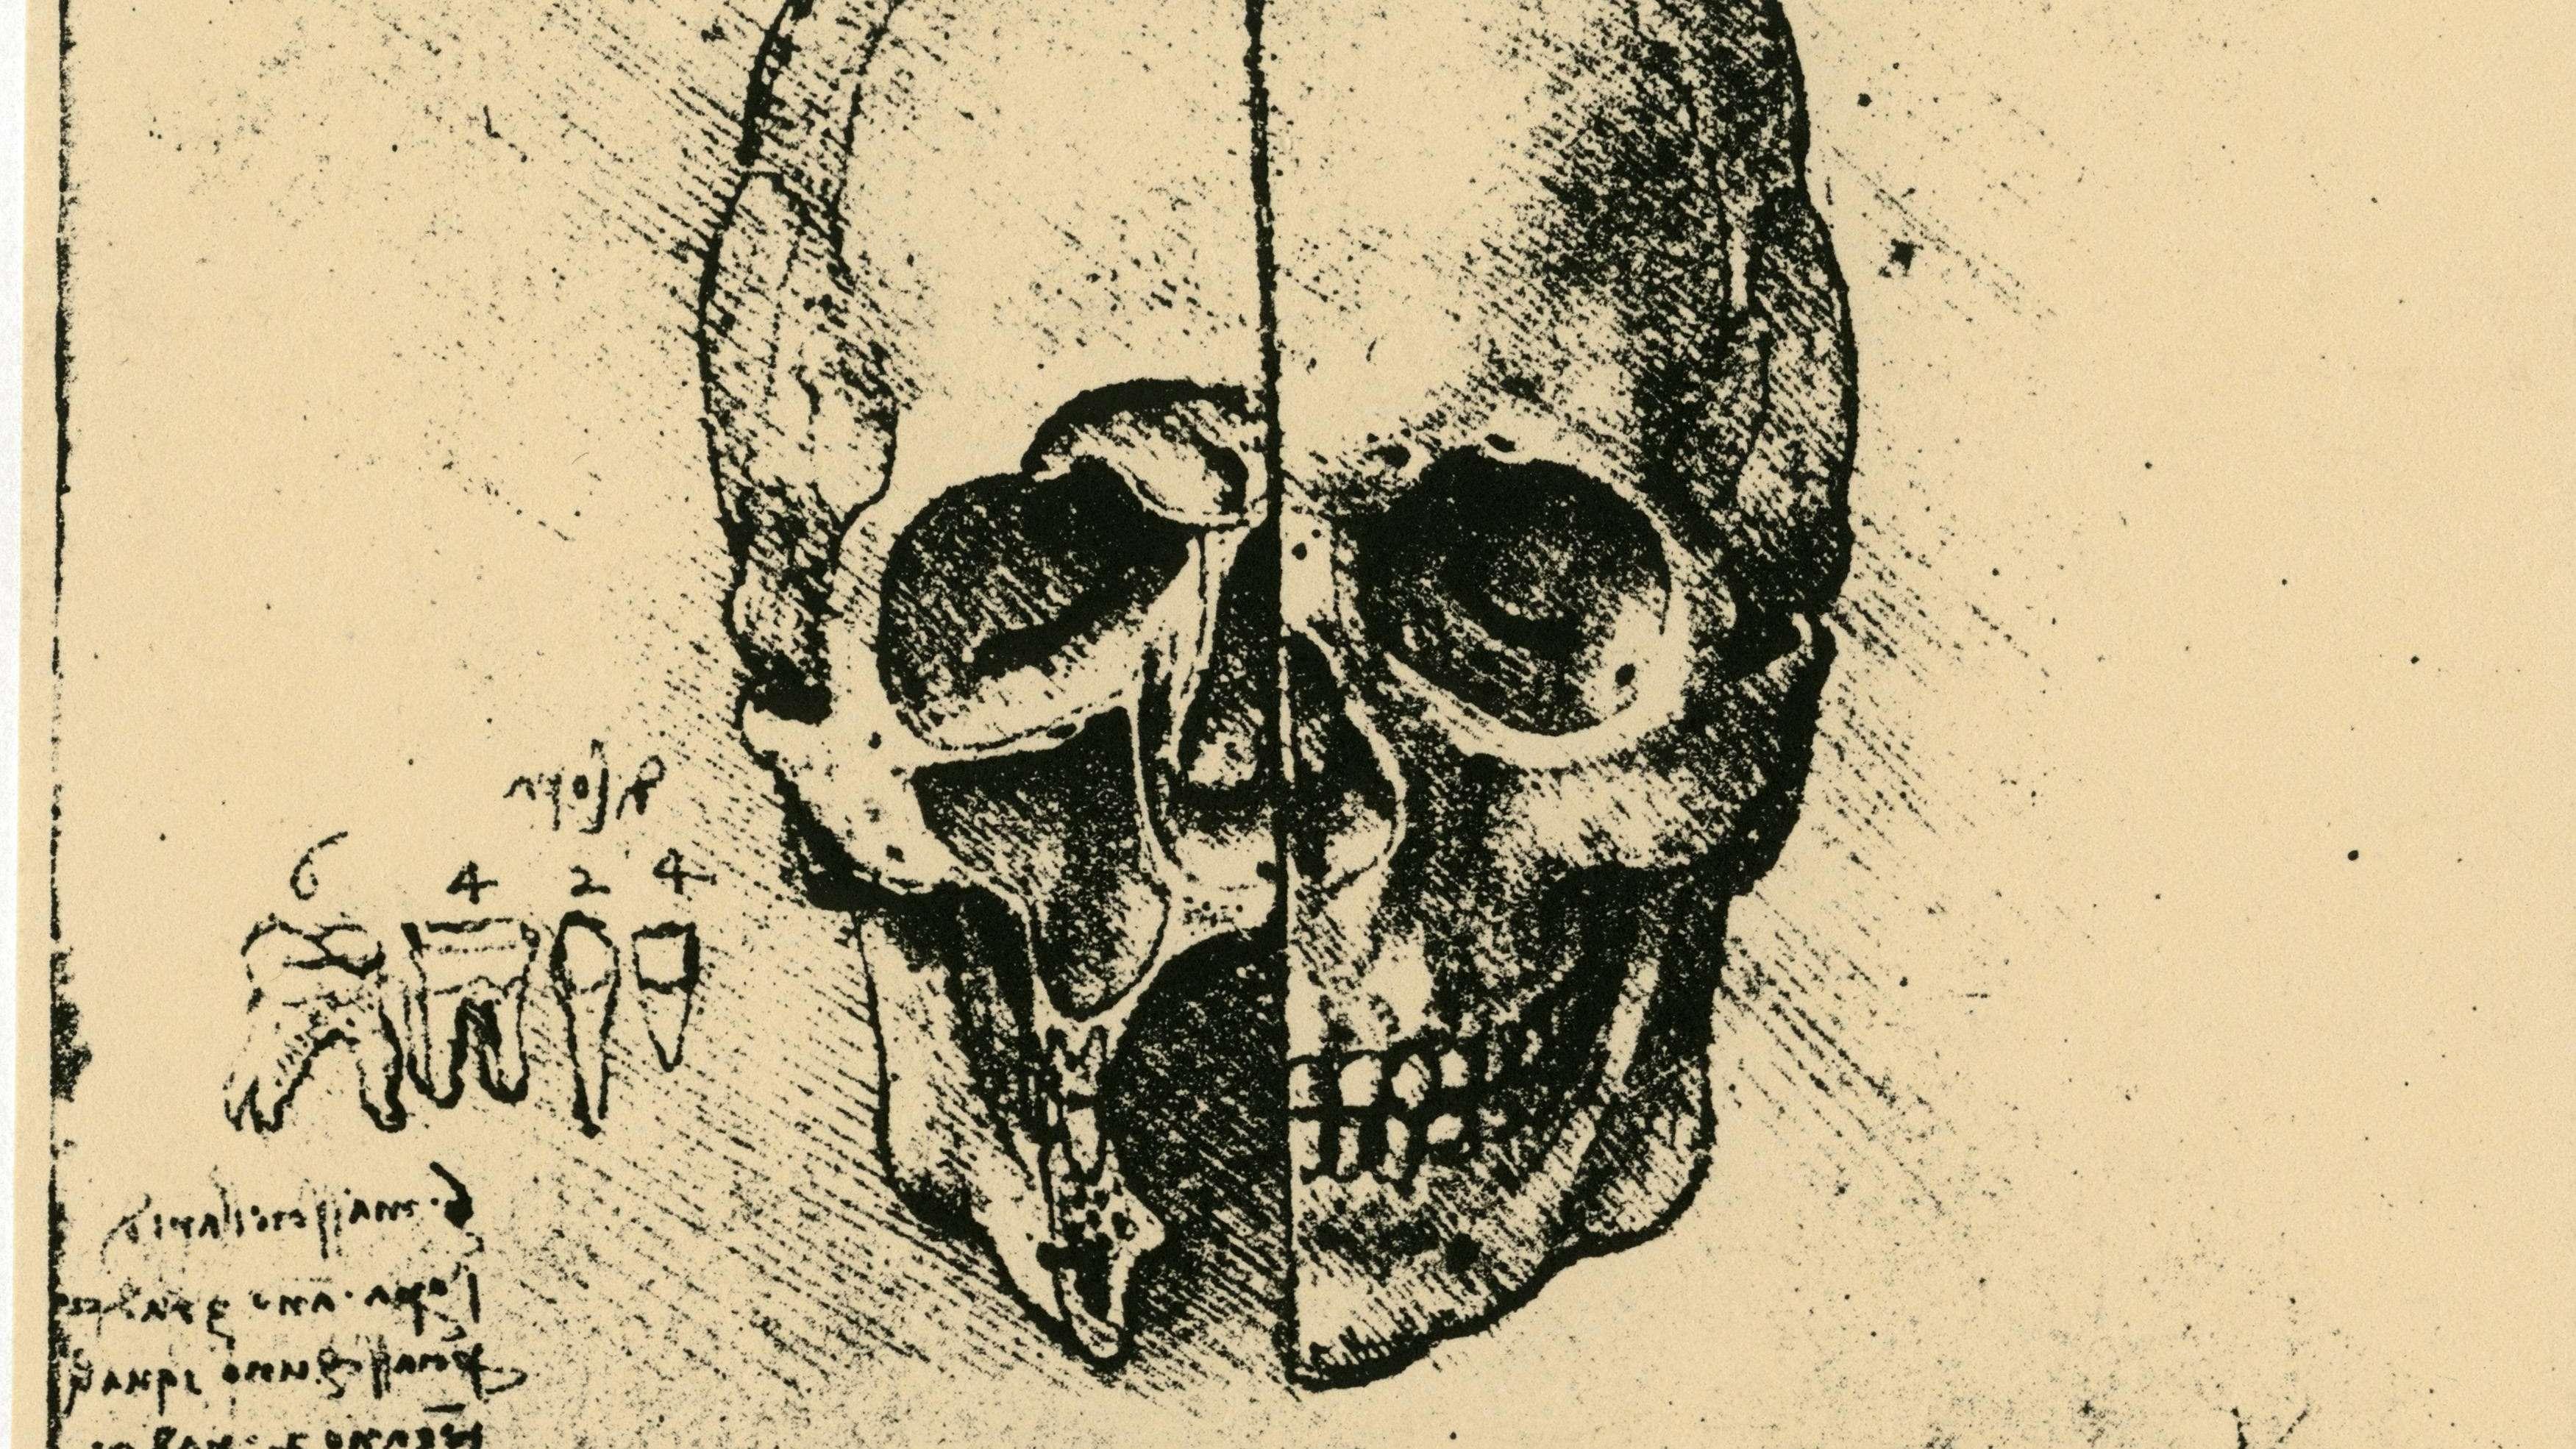 Anatomie-Skizze von Leonardo da Vinci